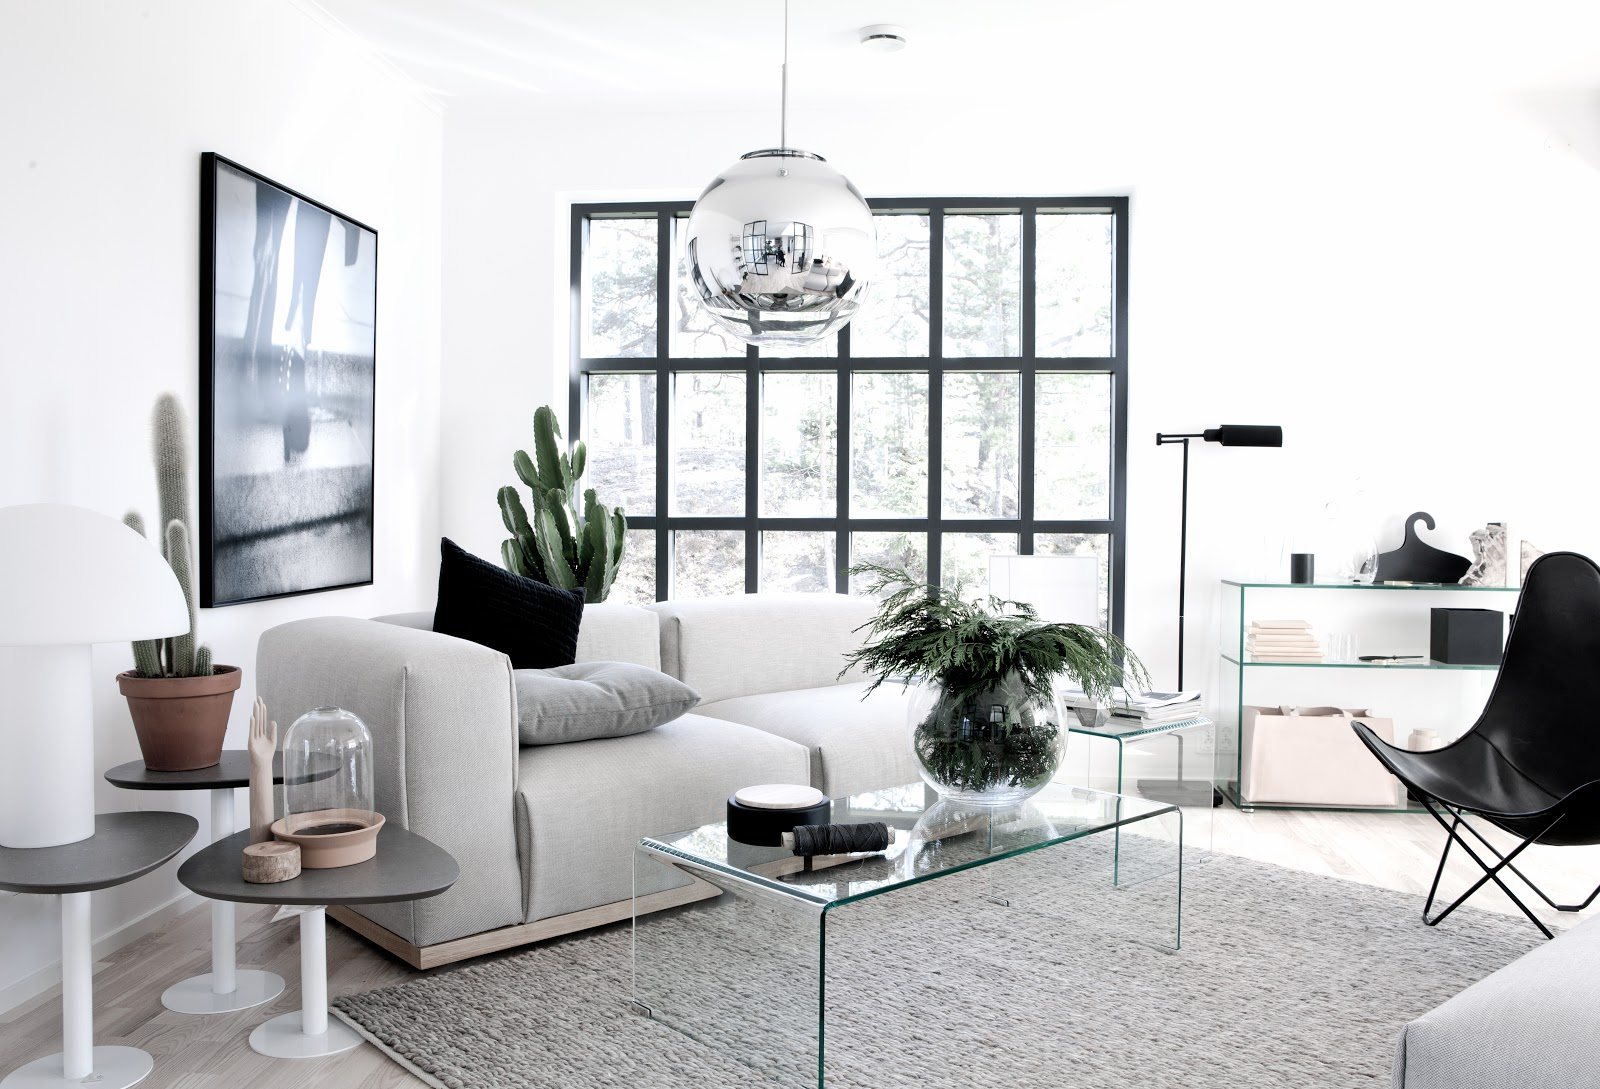 Kleur interieur een licht en wit interieur stijlvol styling woonblog - Interieur decoratie modern hout ...